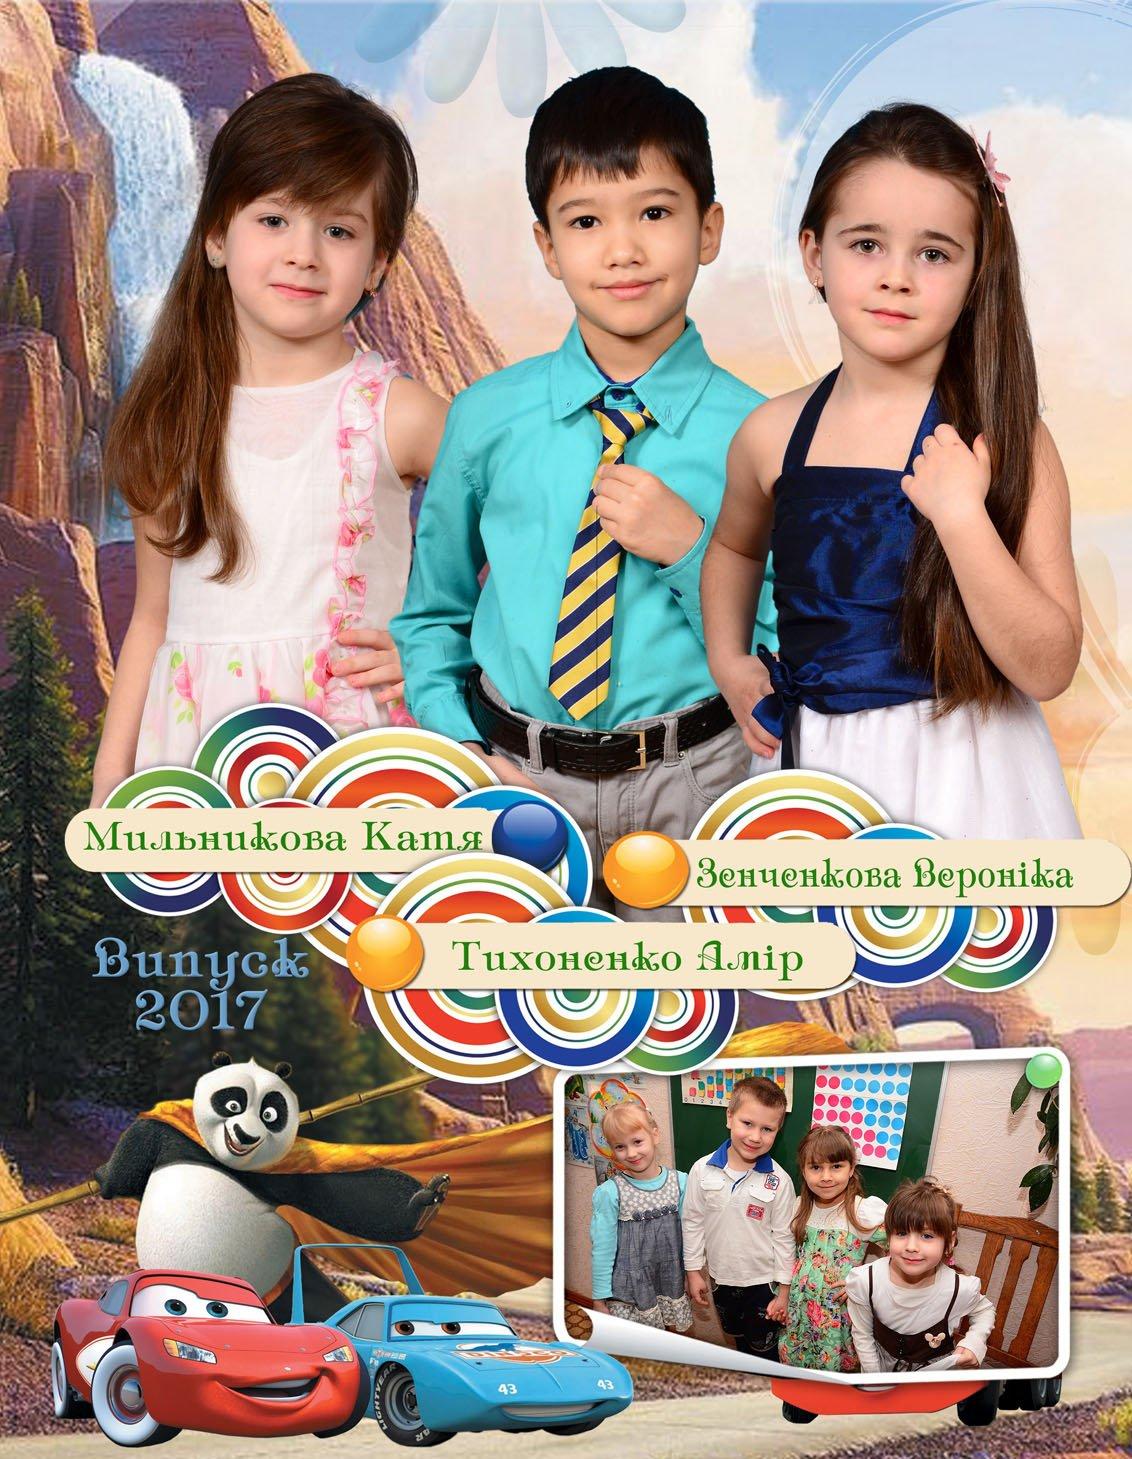 https://school-photo.com.ua/wp-content/uploads/2017/07/06-11.jpg